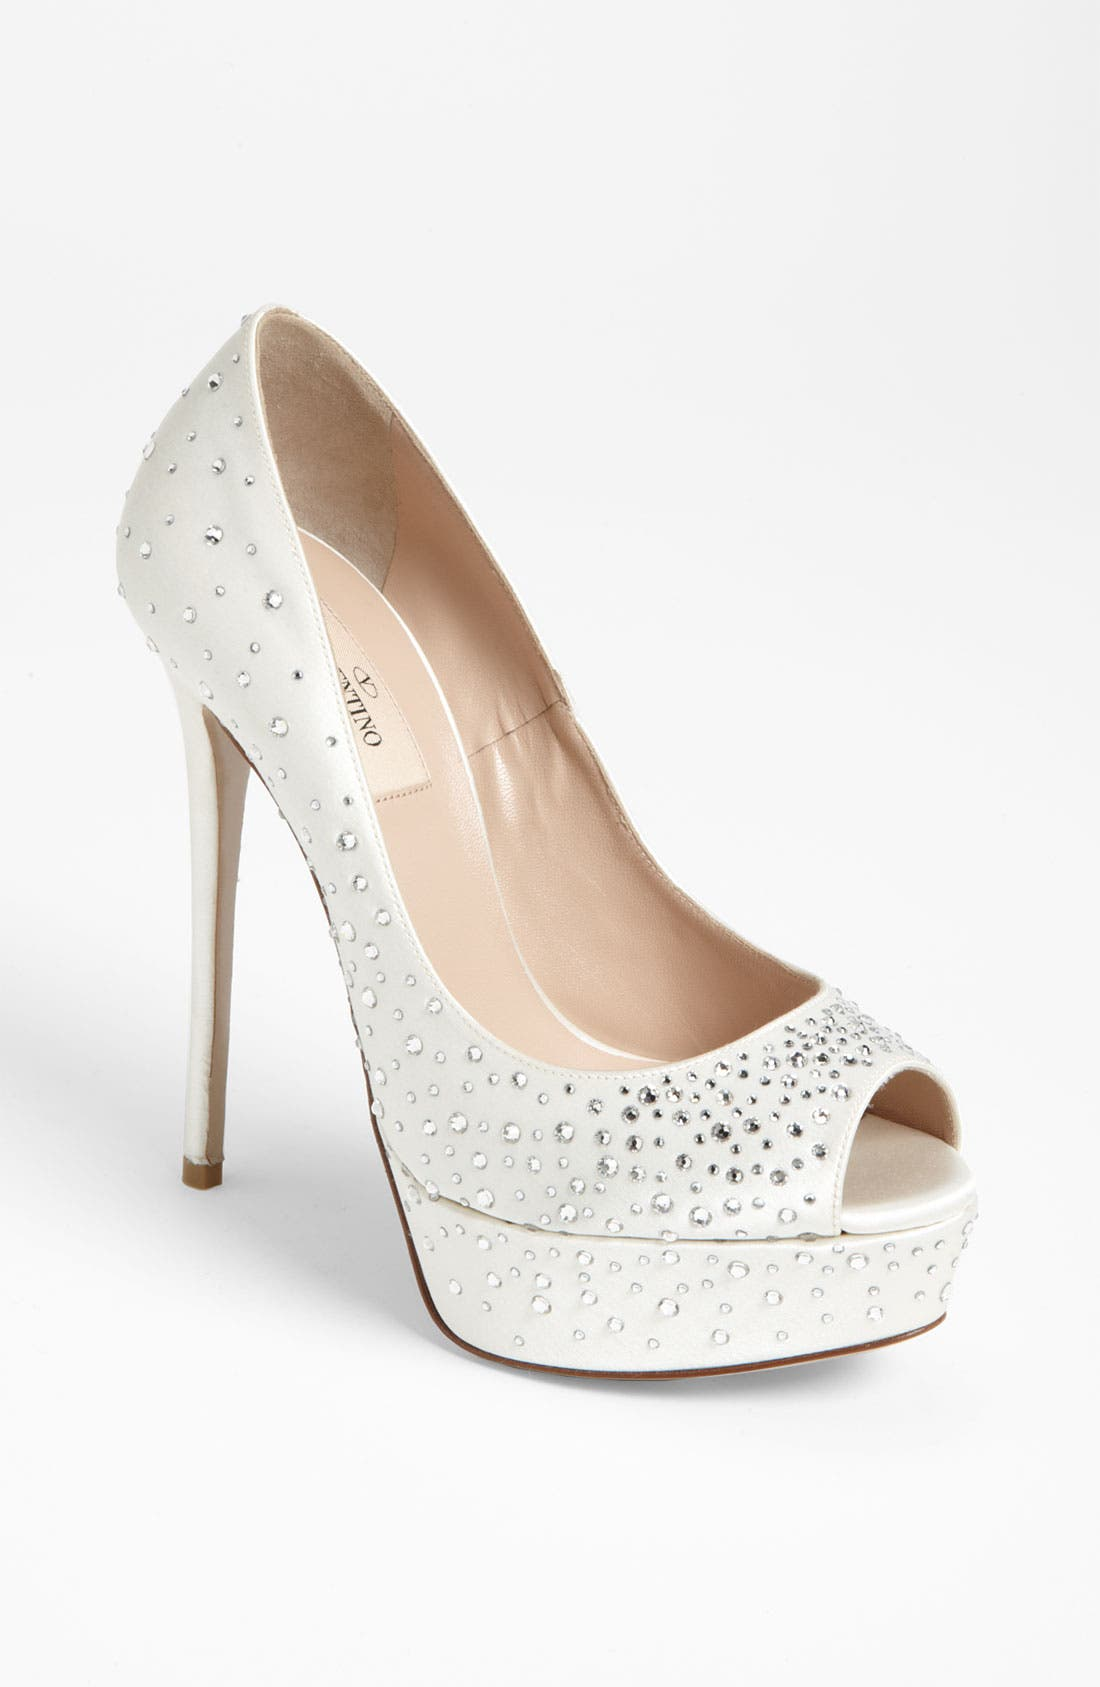 Main Image - Valentino 'Bridal' Open Toe Pump